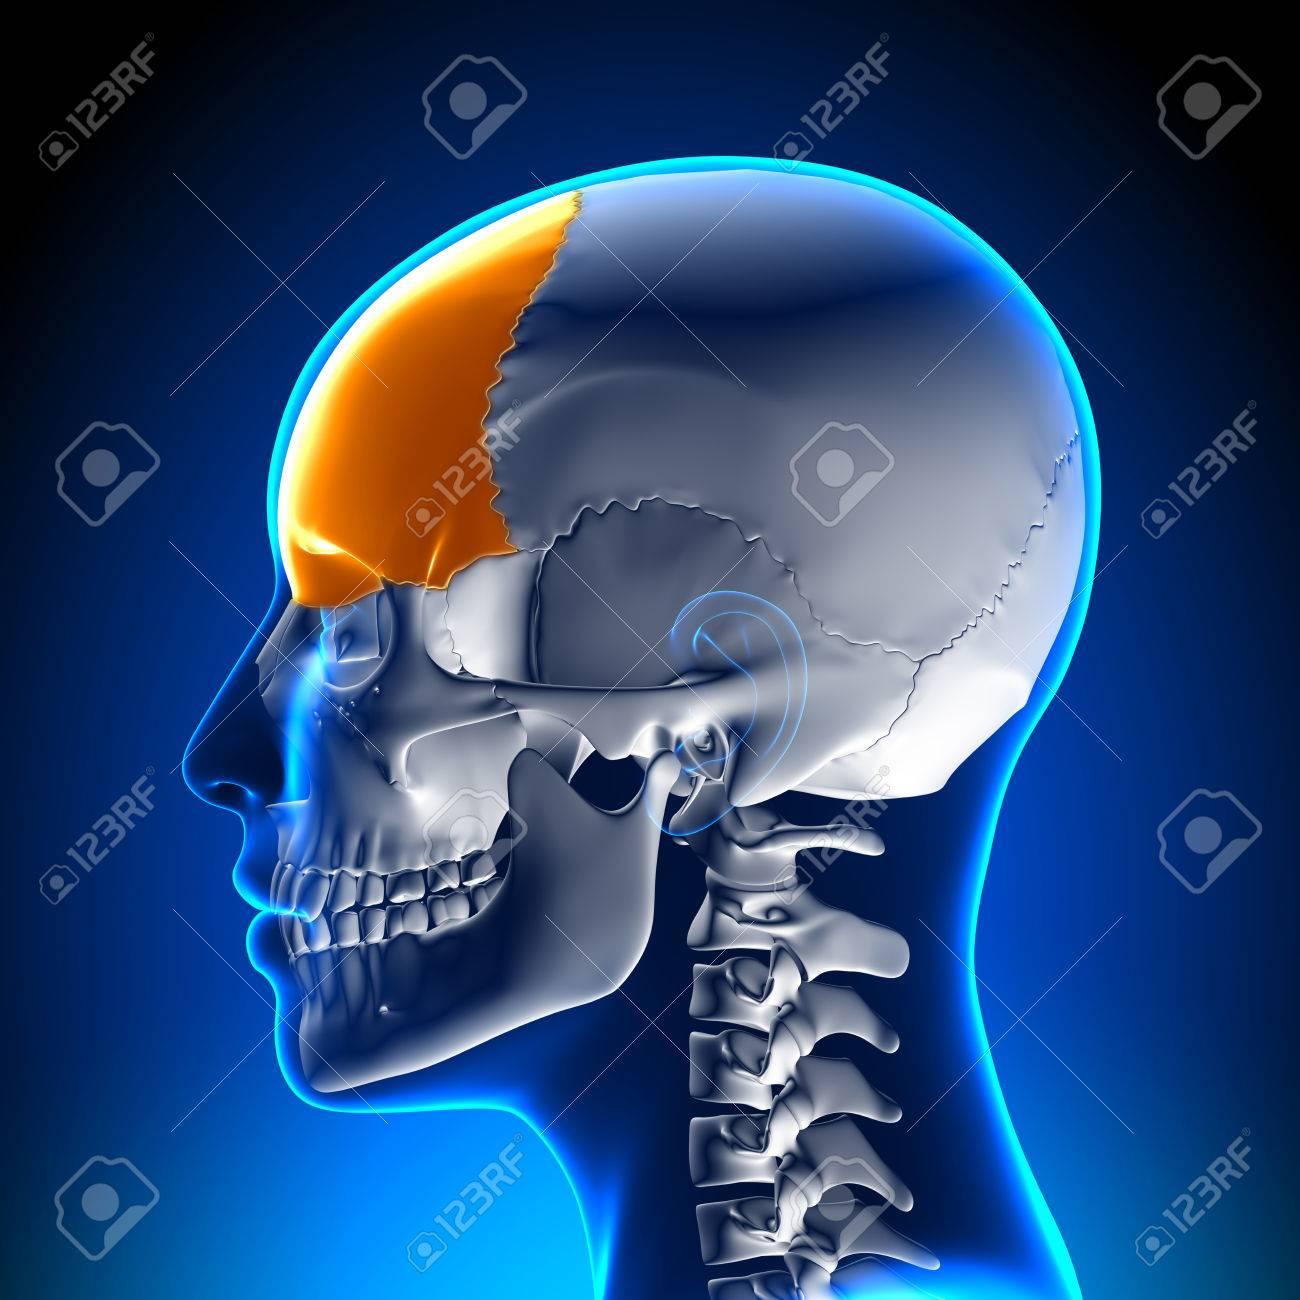 Female Frontal Bone - Skull / Cranium Anatomy Stock Photo, Picture ...